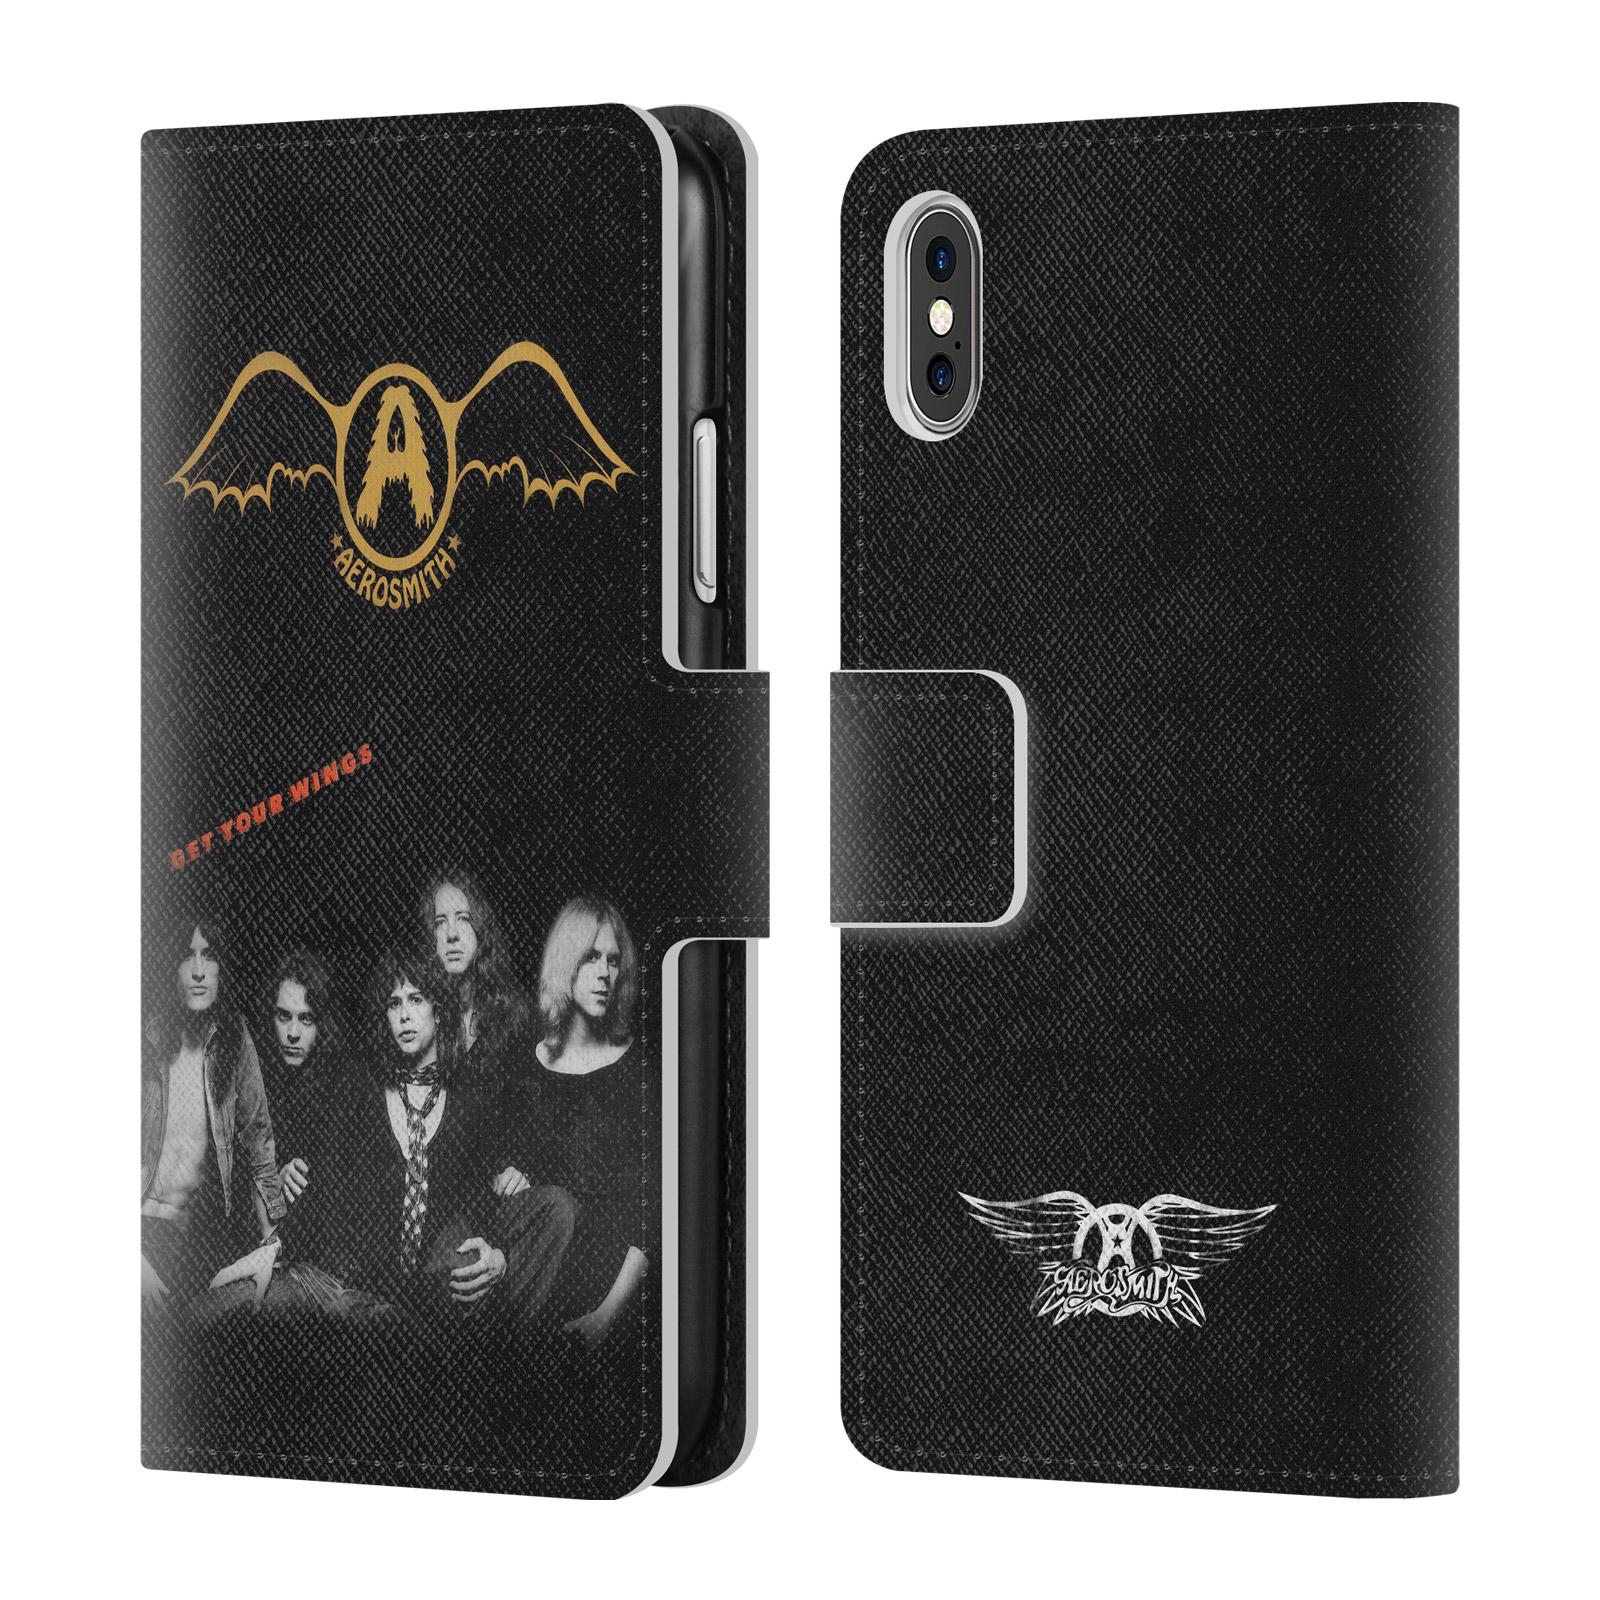 UFFICIALE-AEROSMITH-ALBUM-COVER-A-PORTAFOGLIO-IN-PELLE-PER-APPLE-iPHONE-TELEFONI